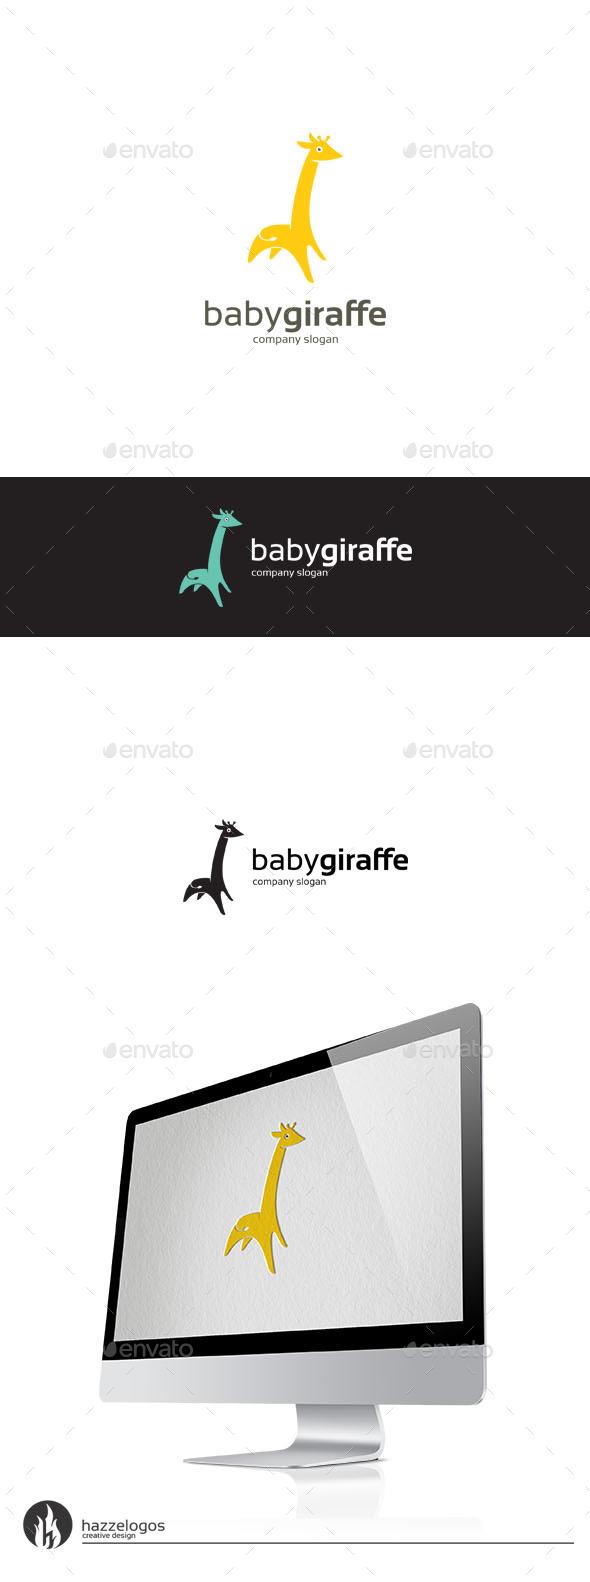 GraphicRiver Baby Giraffe Logo 10033881